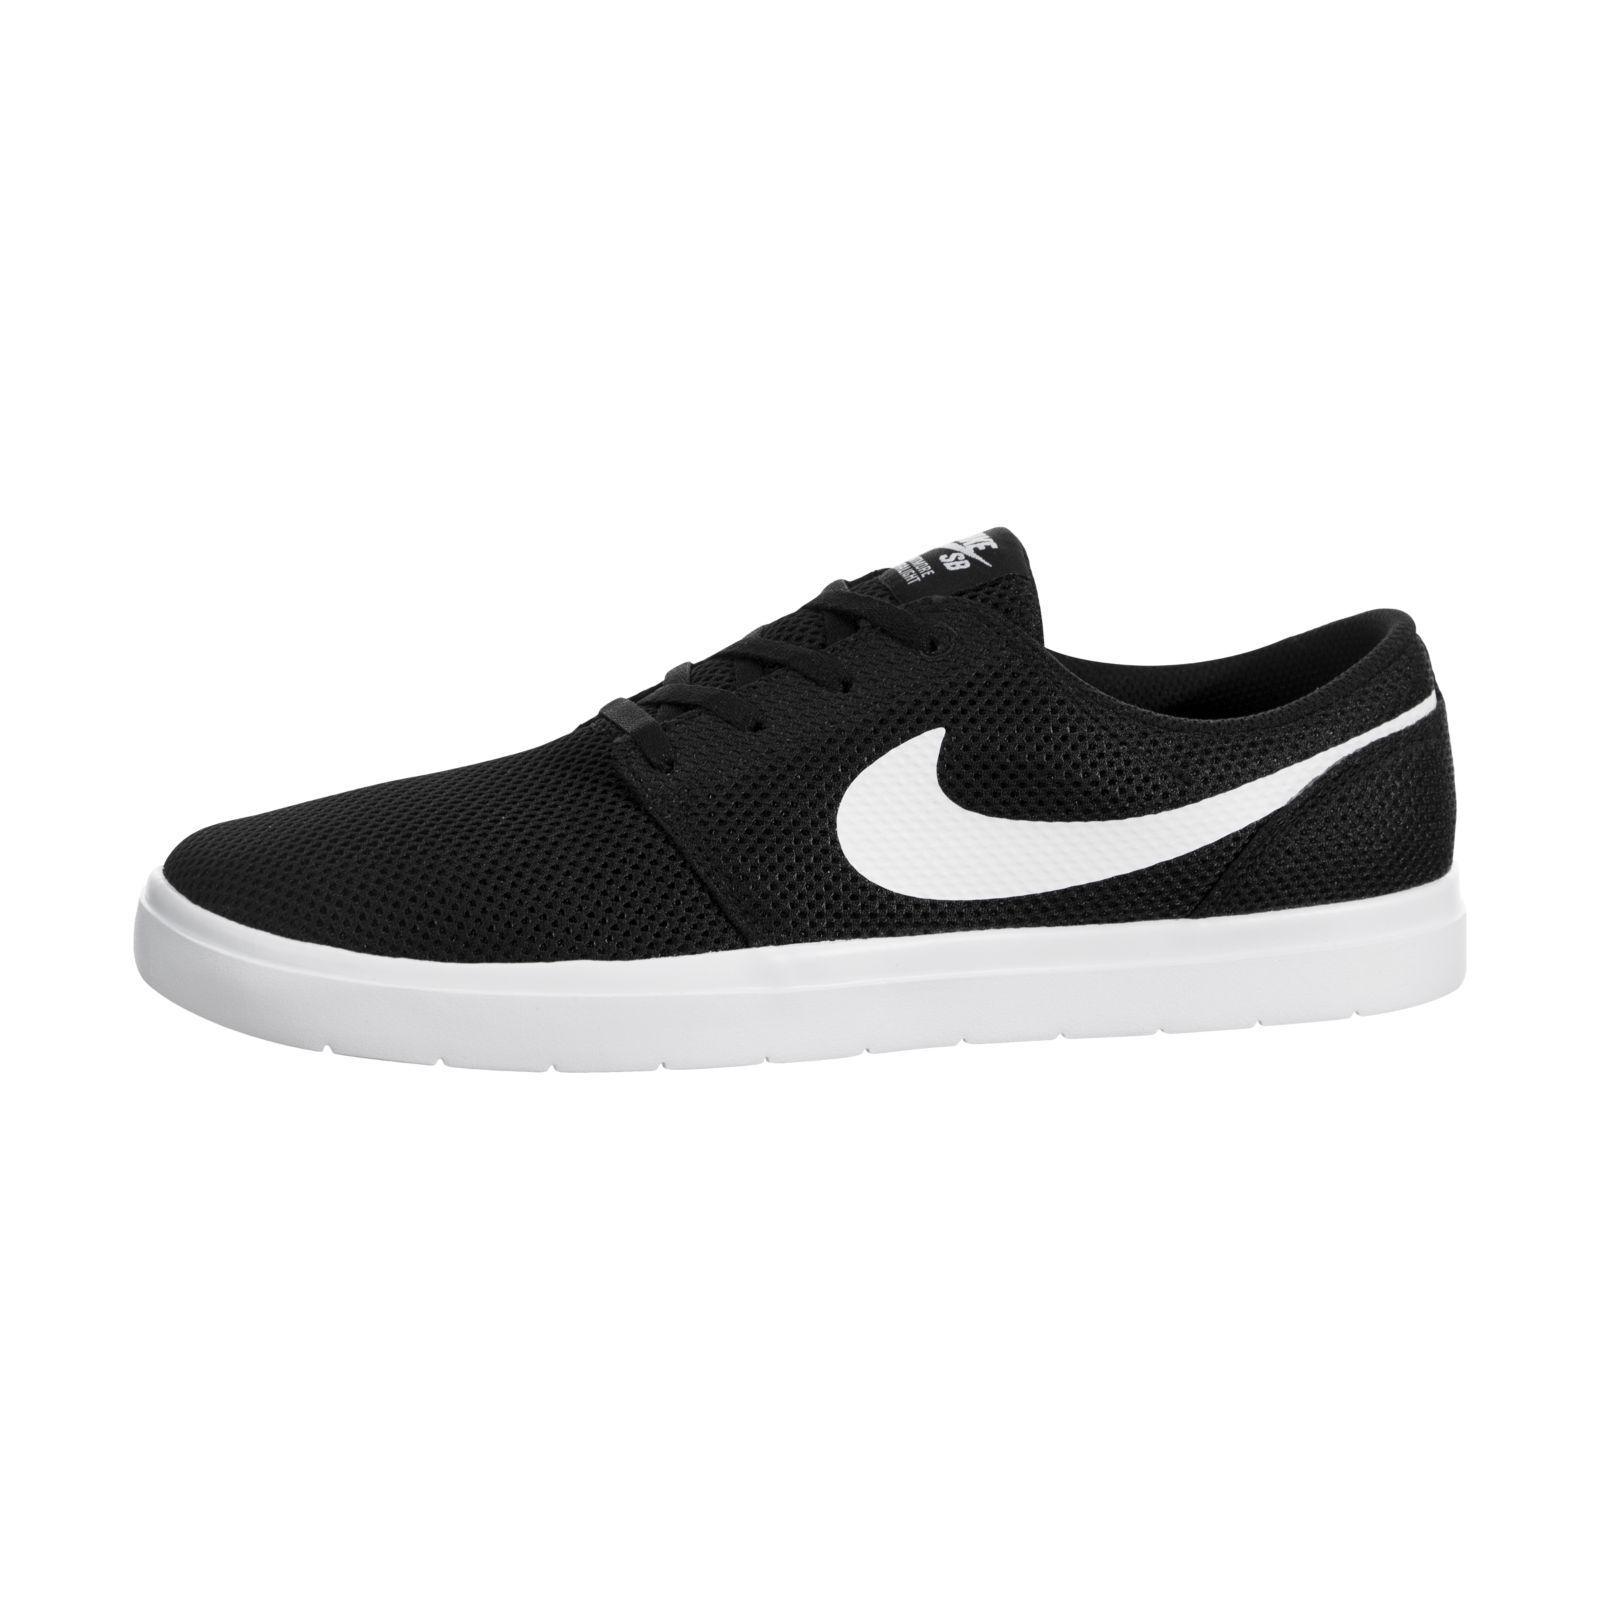 Nike SB Portmore II Ultralight Black / White